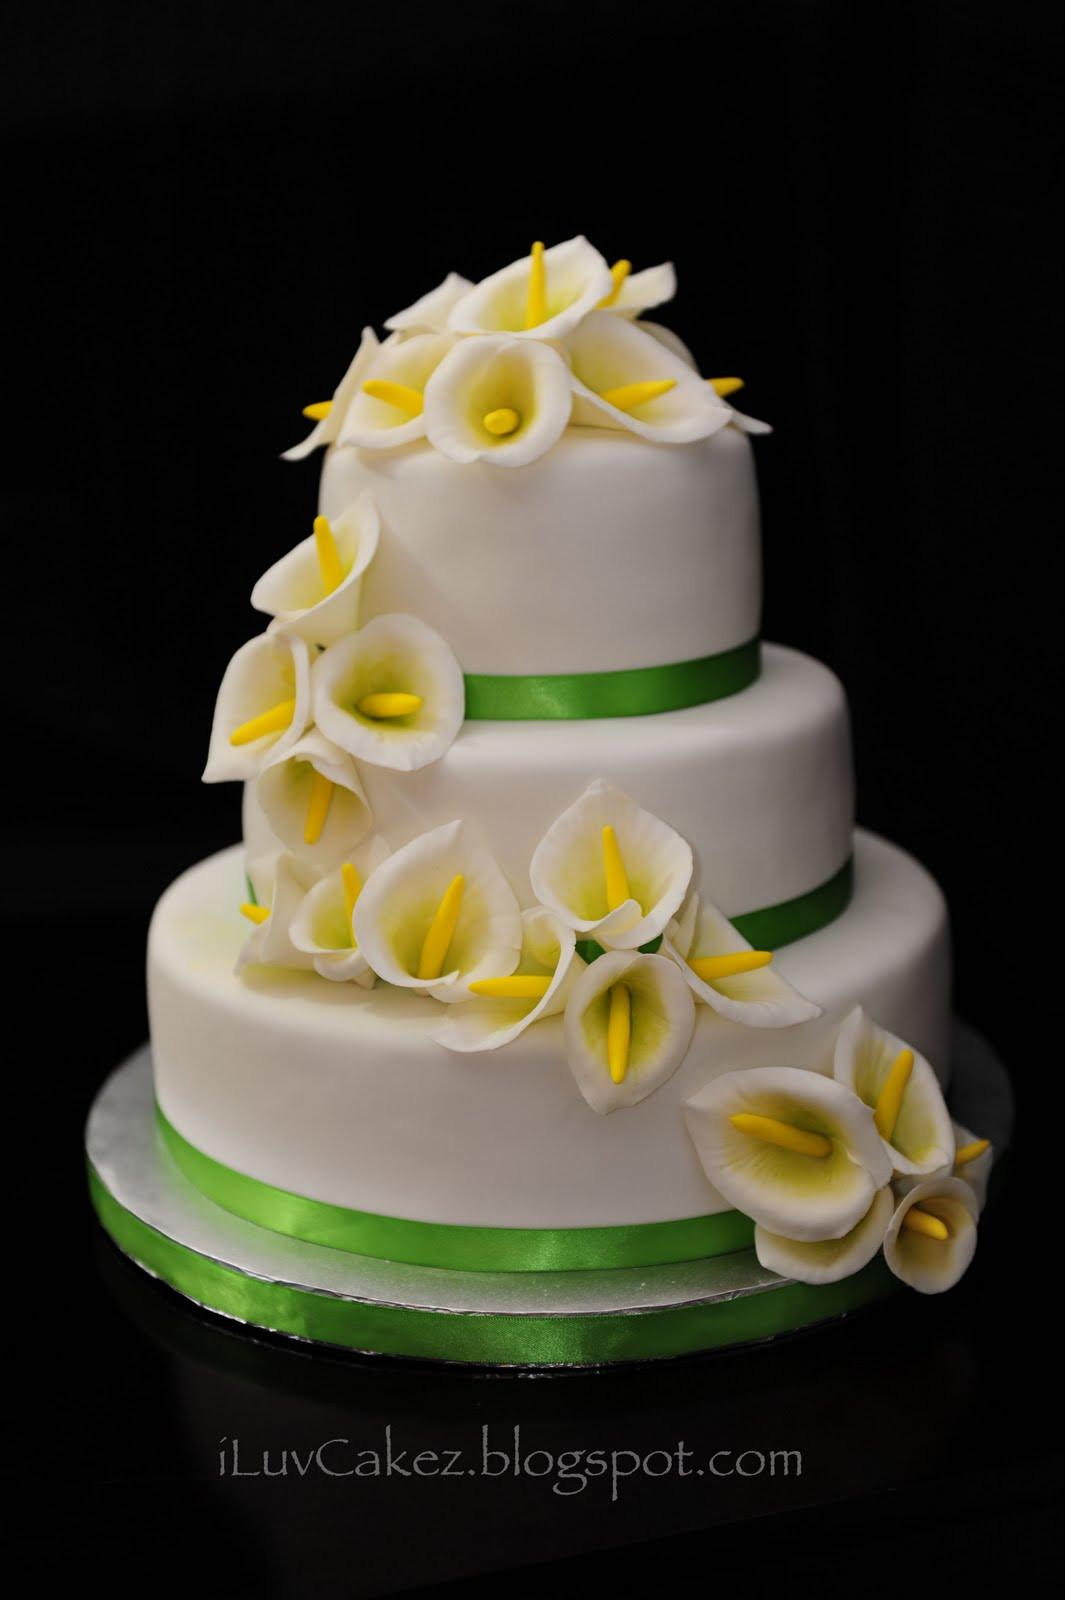 Calla Lilies Wedding Cakes  iLuv Cakez Calla Lily Wedding Cake Daniel & Susan